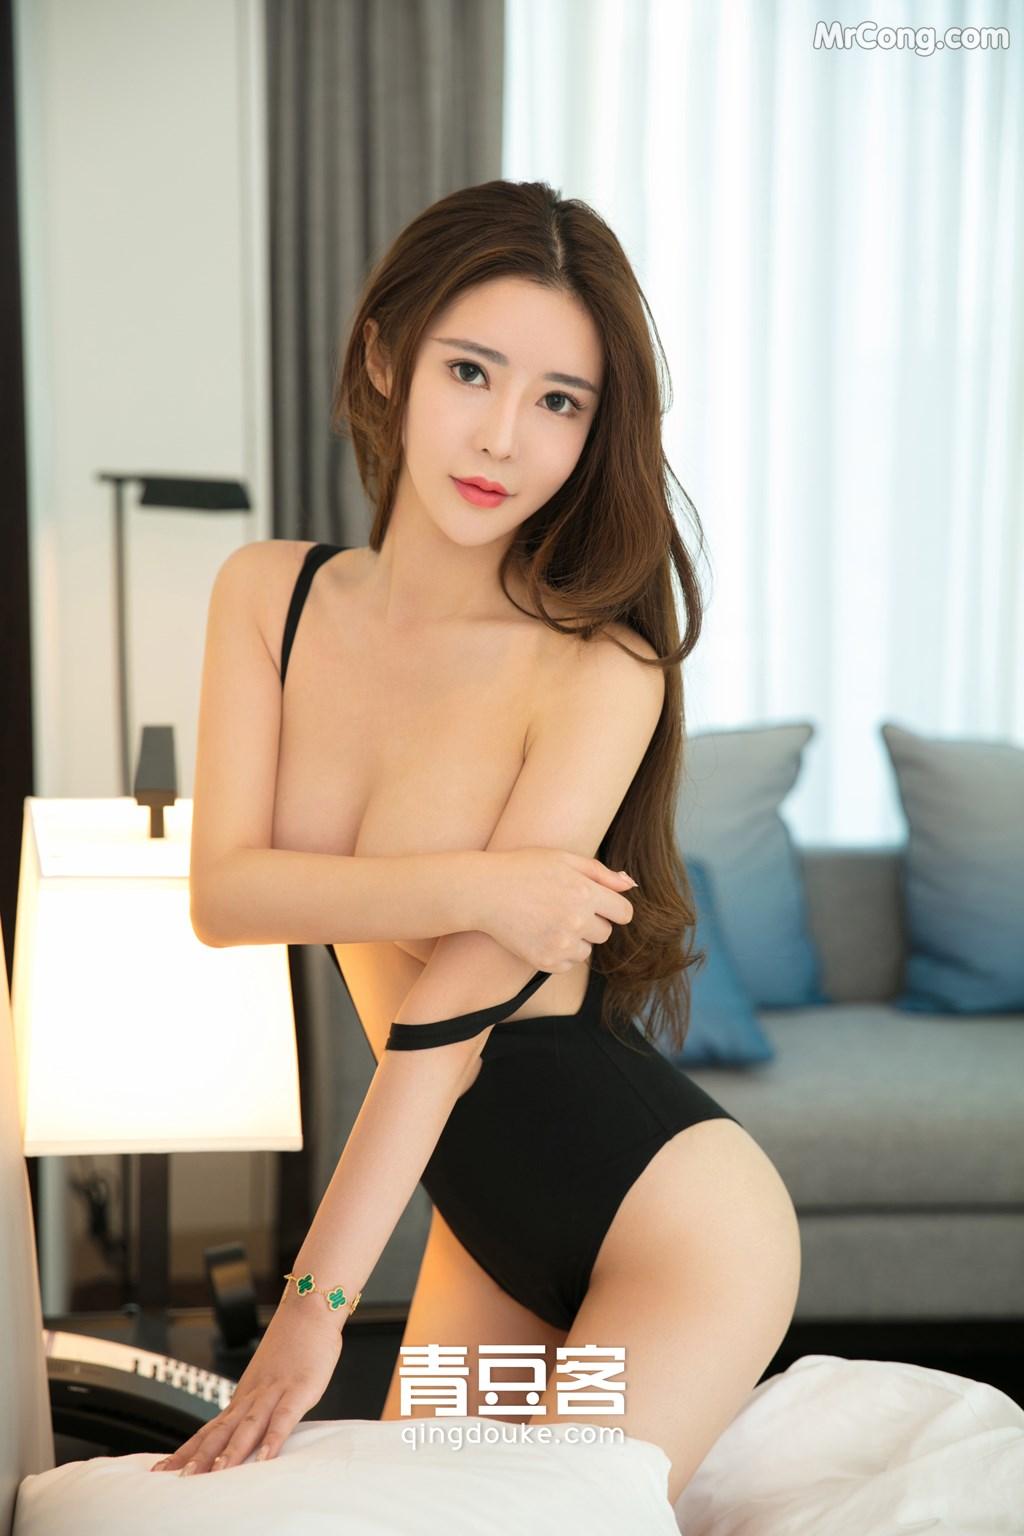 Image QingDouKe-2017-11-12-Tong-Man-MrCong.com-004 in post QingDouKe 2017-11-12: Người mẫu Tong Man (佟蔓) (50 ảnh)